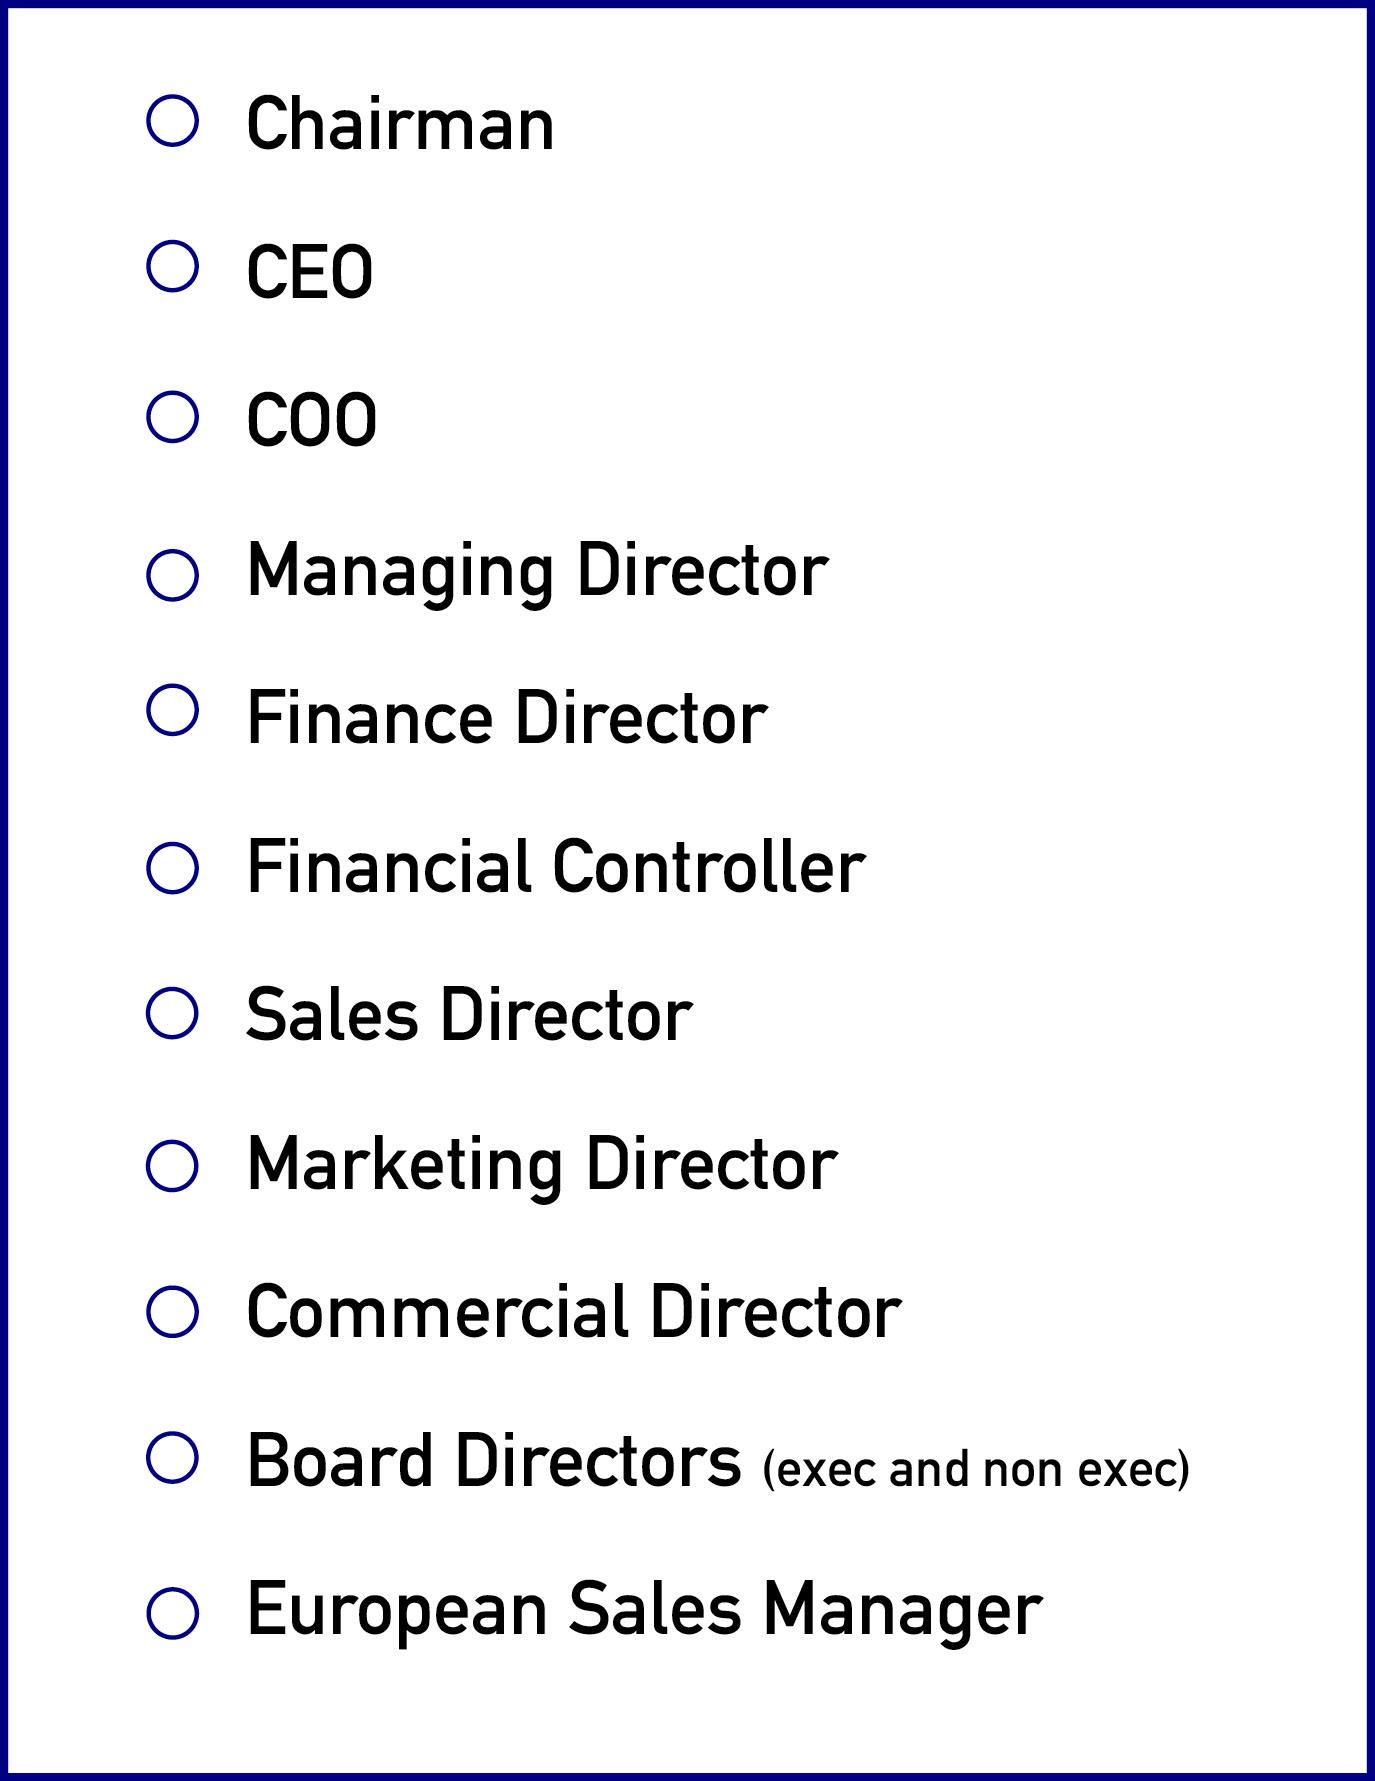 job-titles1.jpg